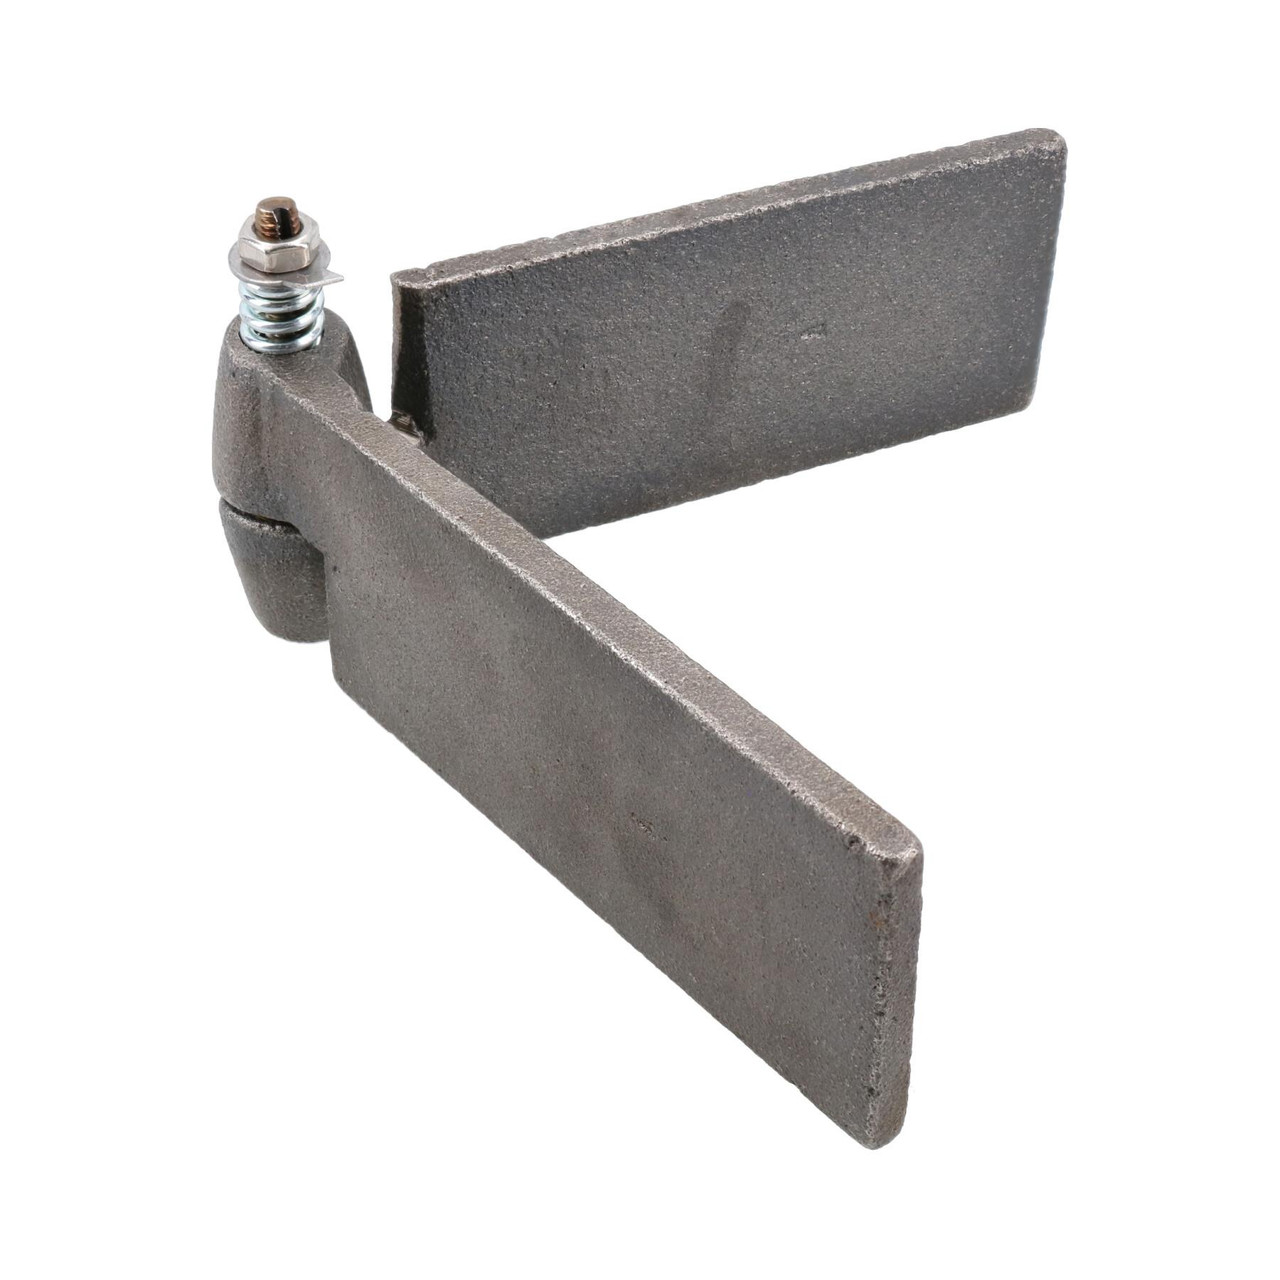 2pk Left Self Aligning Ball Steel Butt Hinge Weld-On Heavy Duty 50x250mm